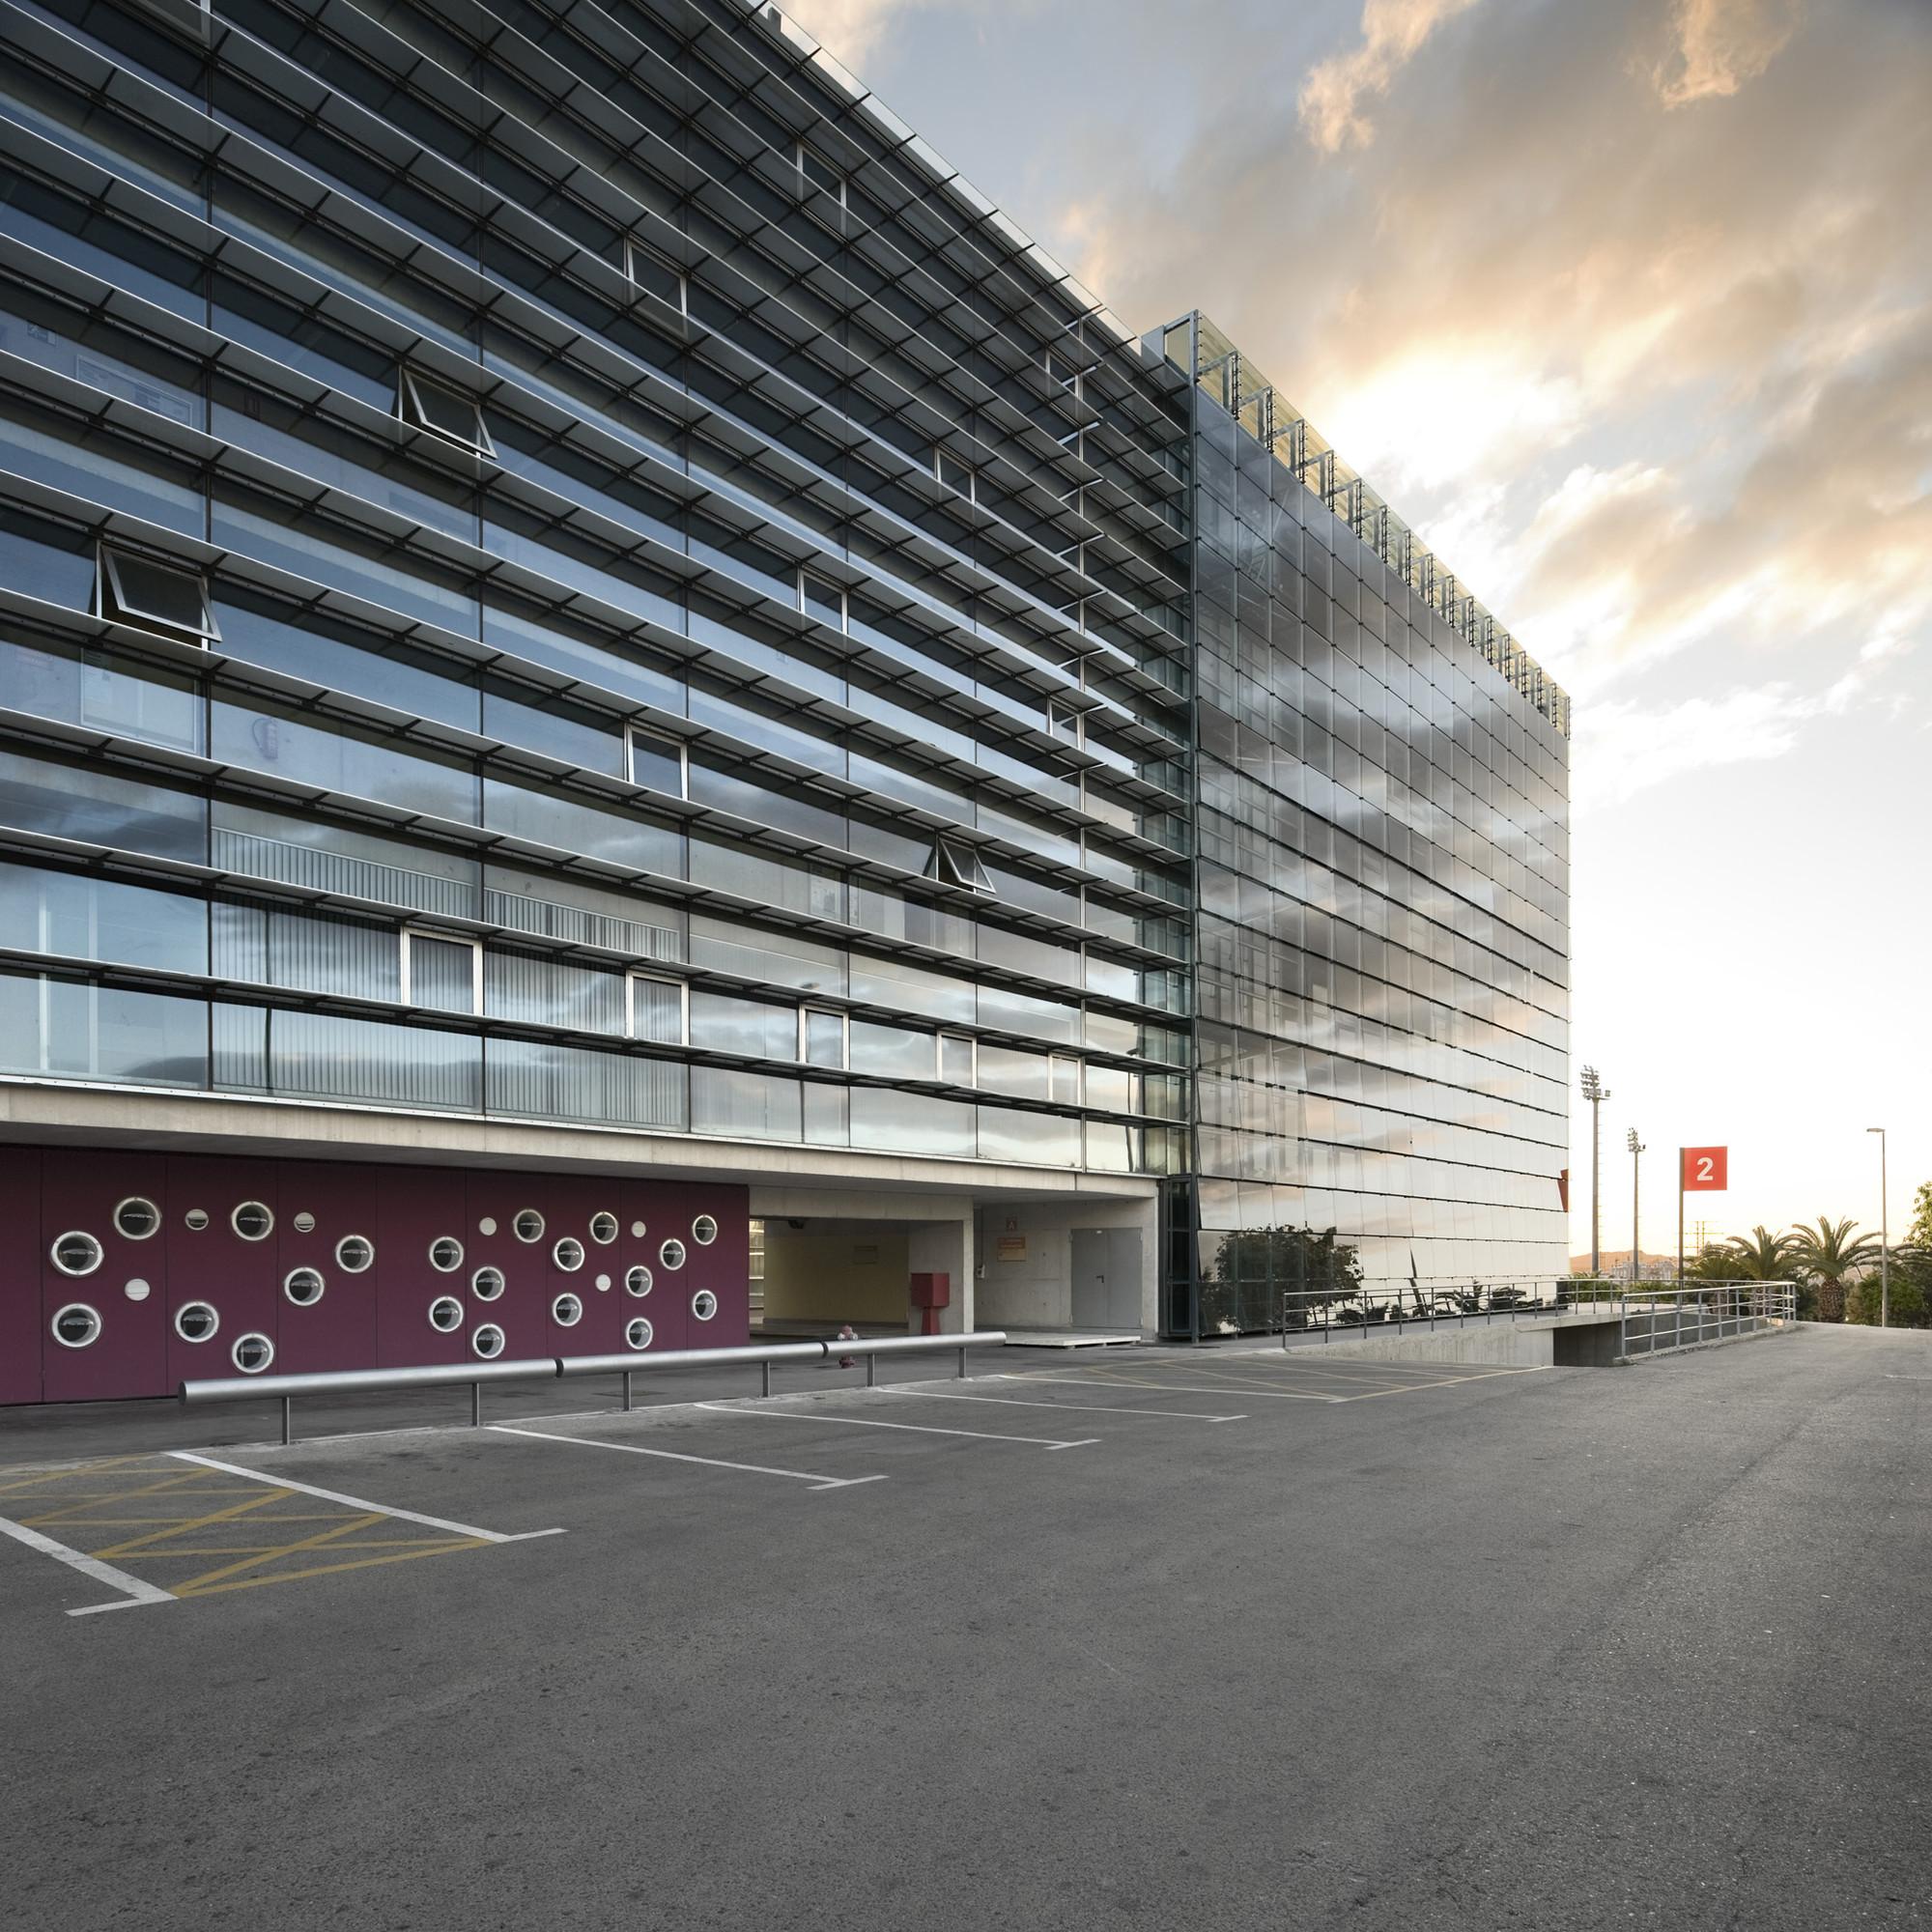 New classrooms for the School of Economics at Murcia University / Ecoproyecta + Ad-hoc msl